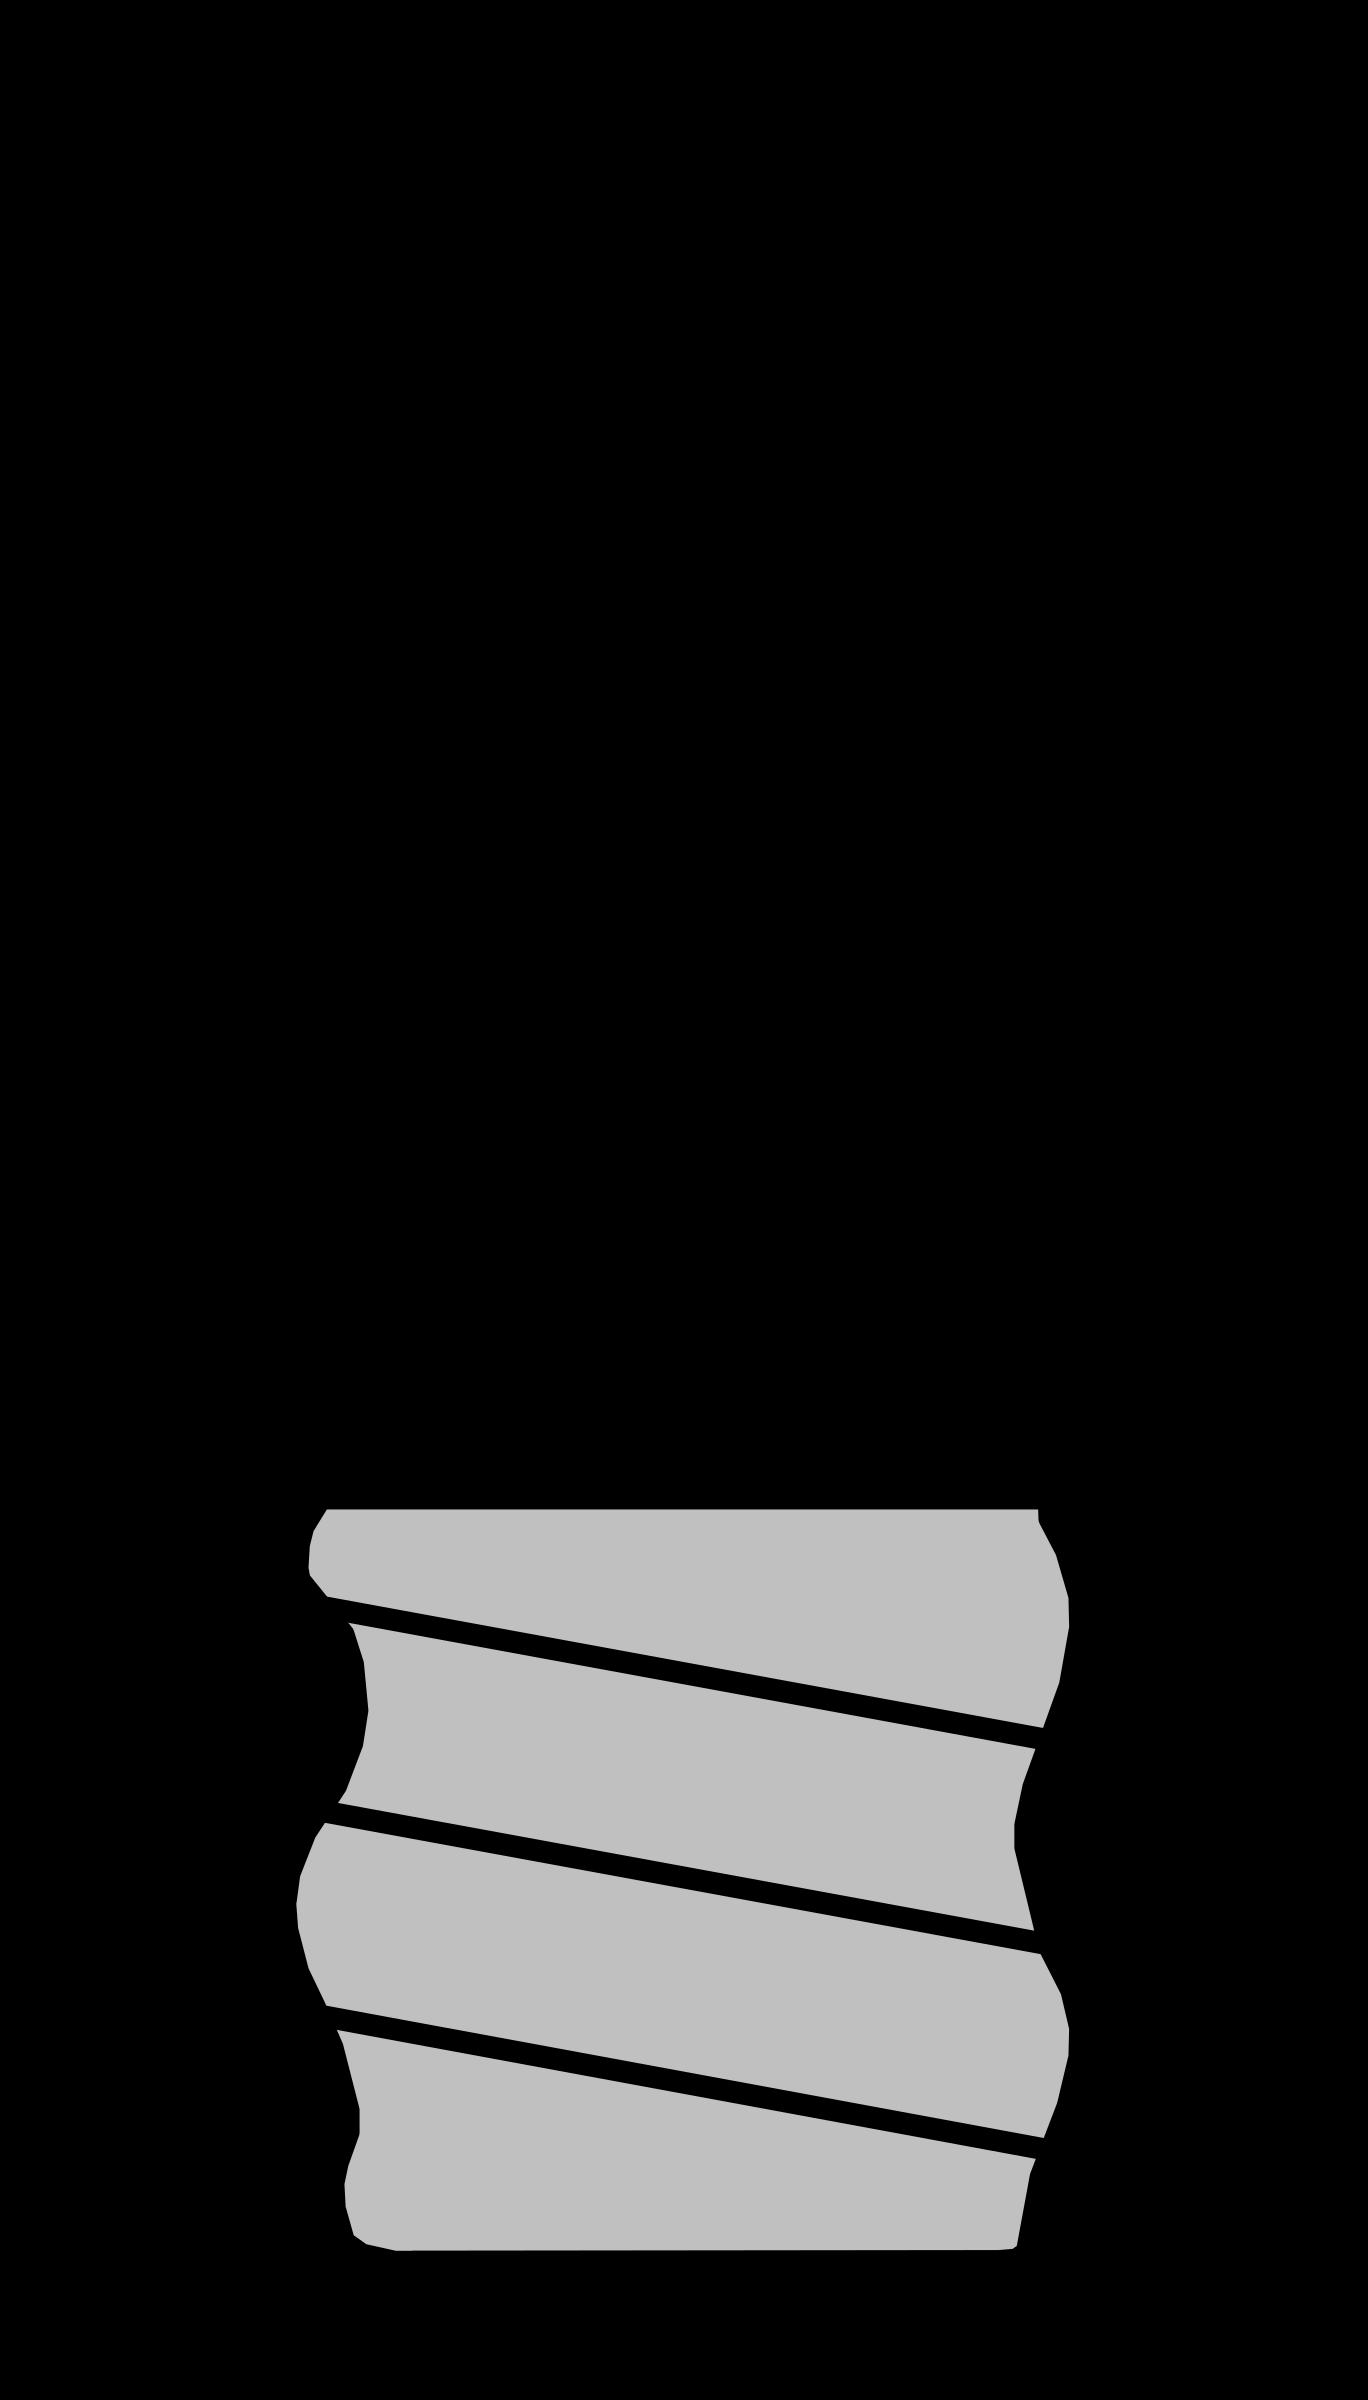 Bulb clip art black. Light clipart solution